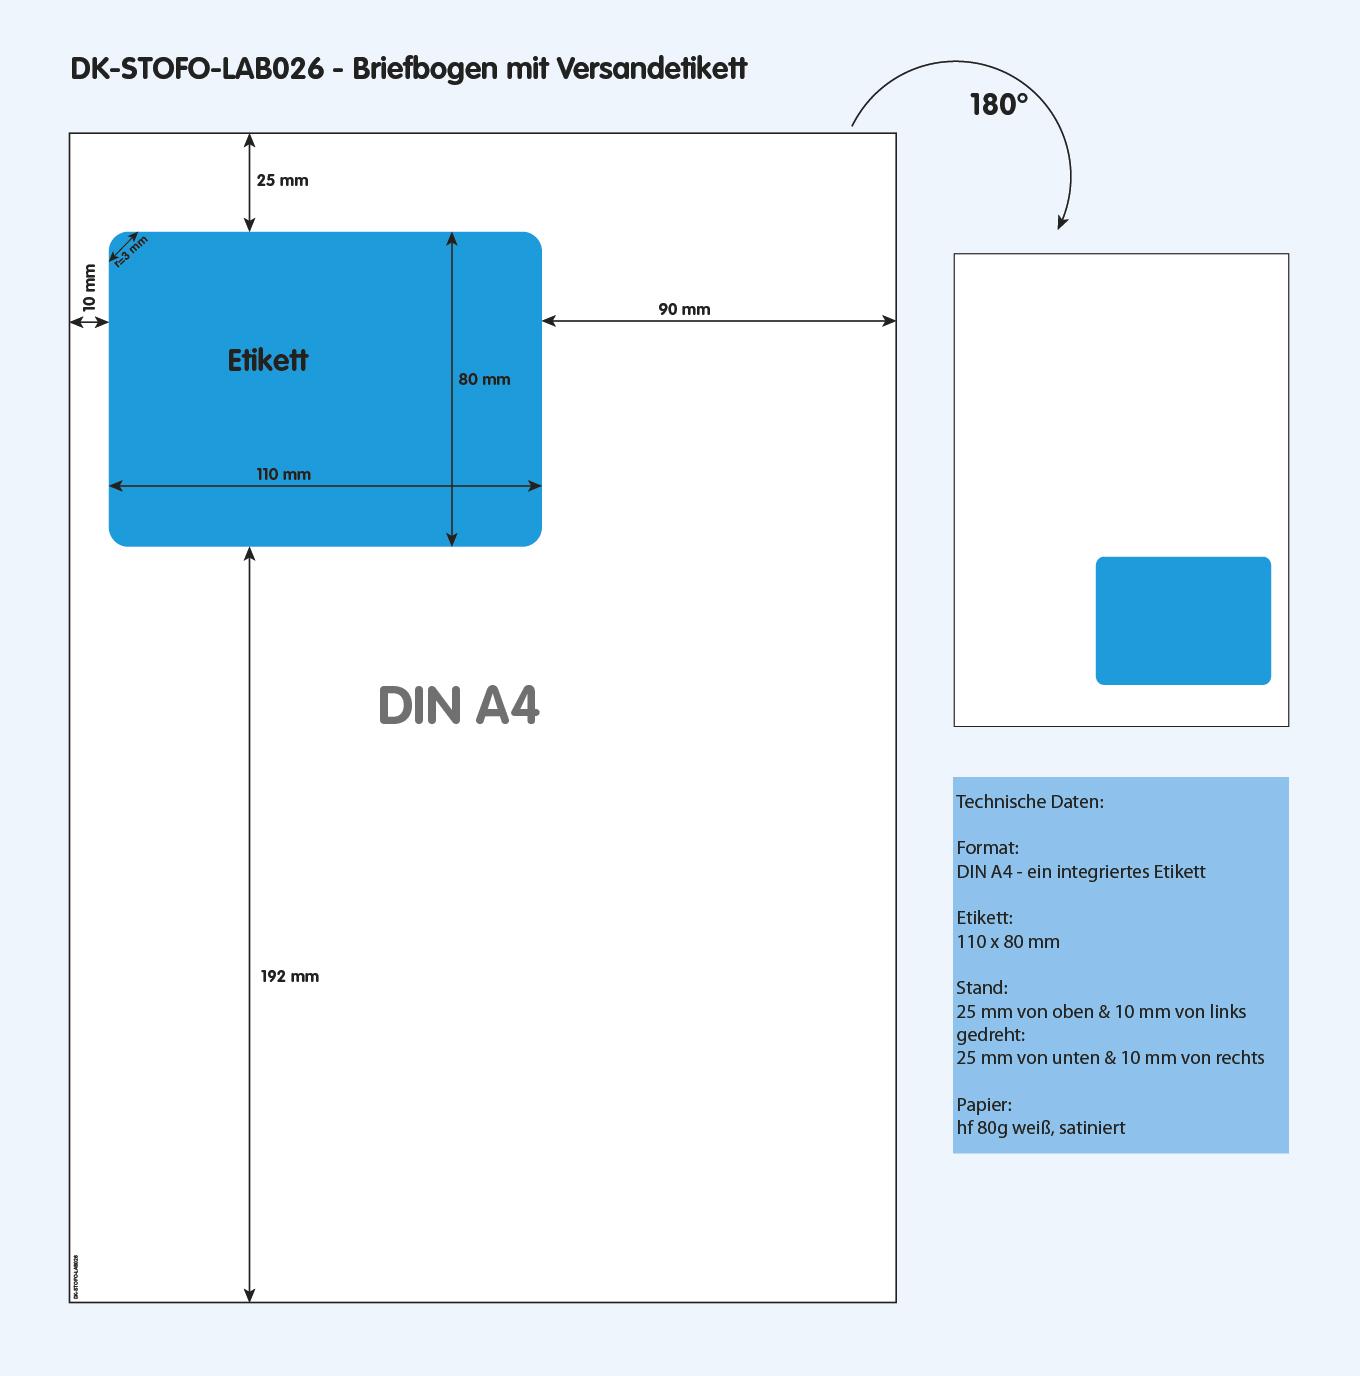 DK-STOFO-LAB026